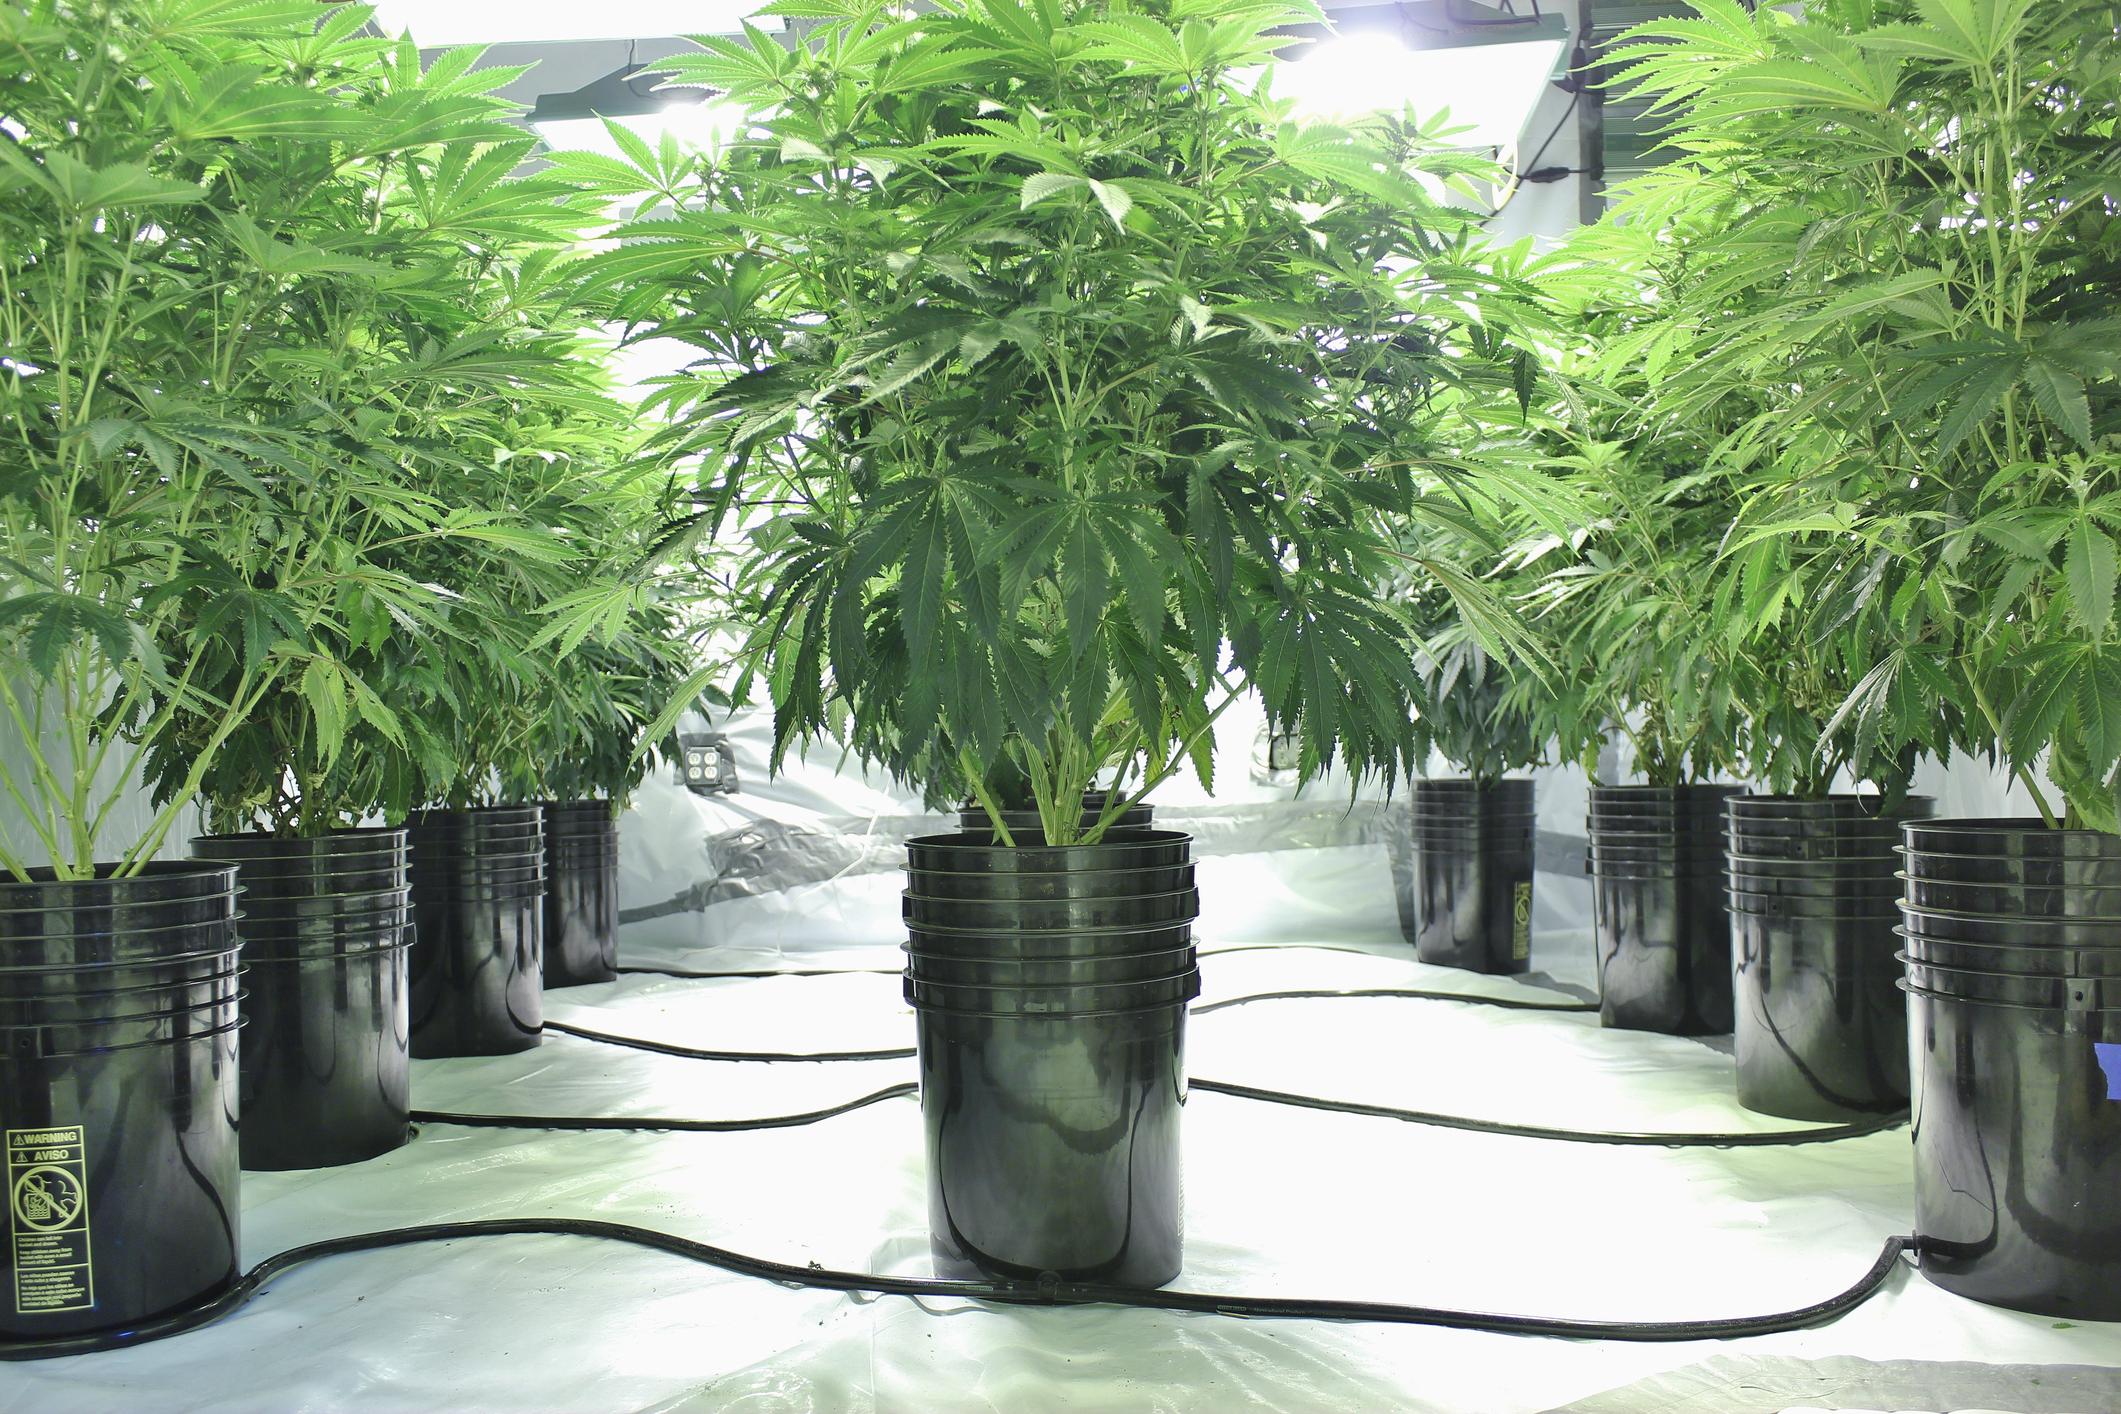 An indoor commercial hydroponic cannabis grow farm.